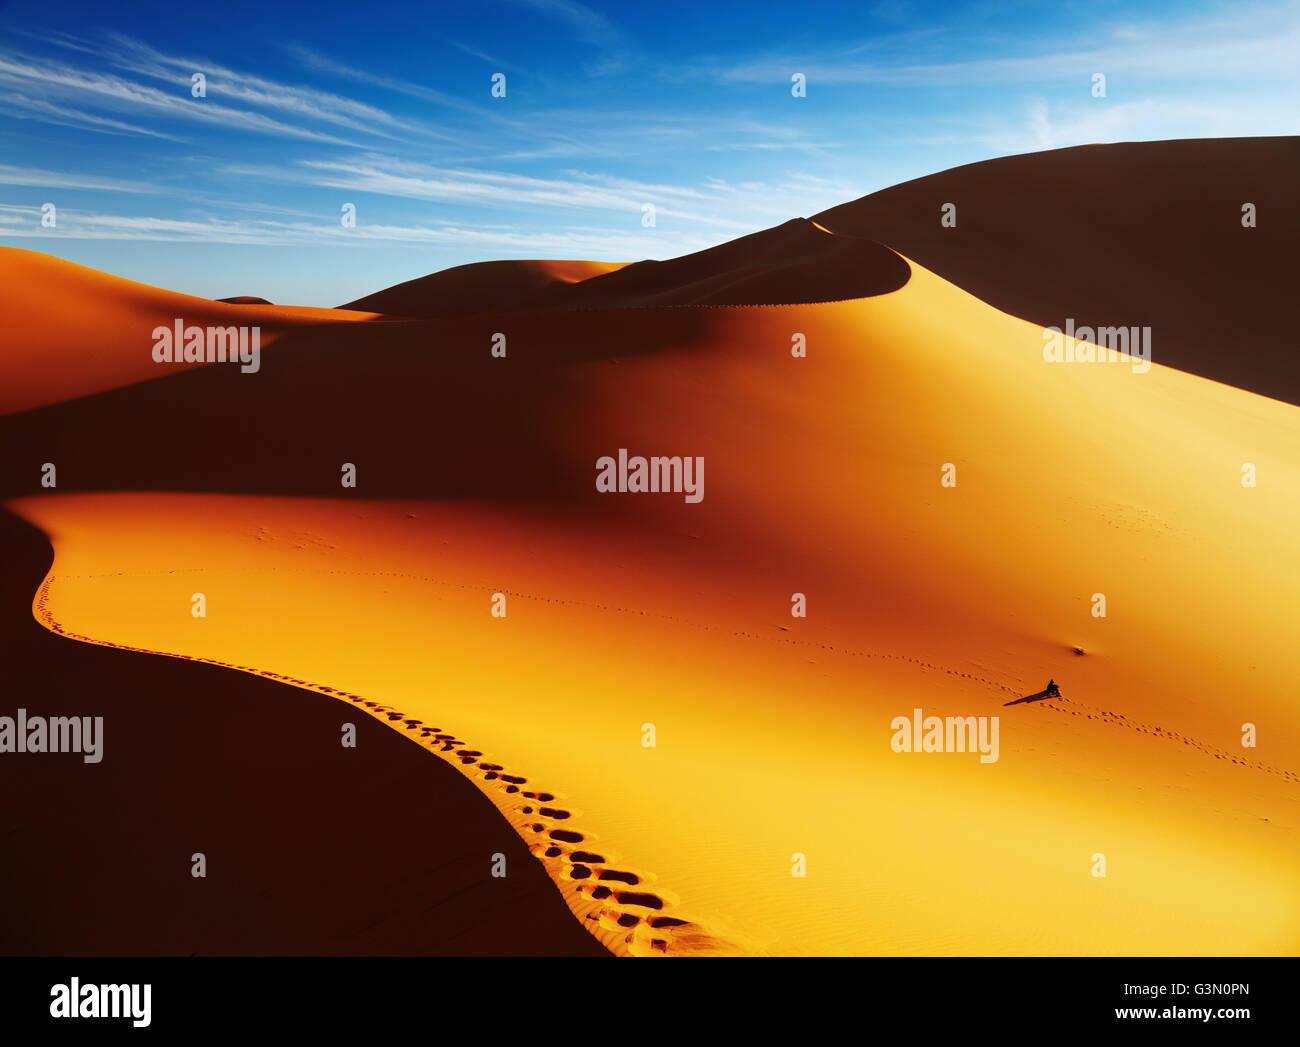 Sand dune with footprints at sunrise, Sahara Desert, Algeria - Stock Image